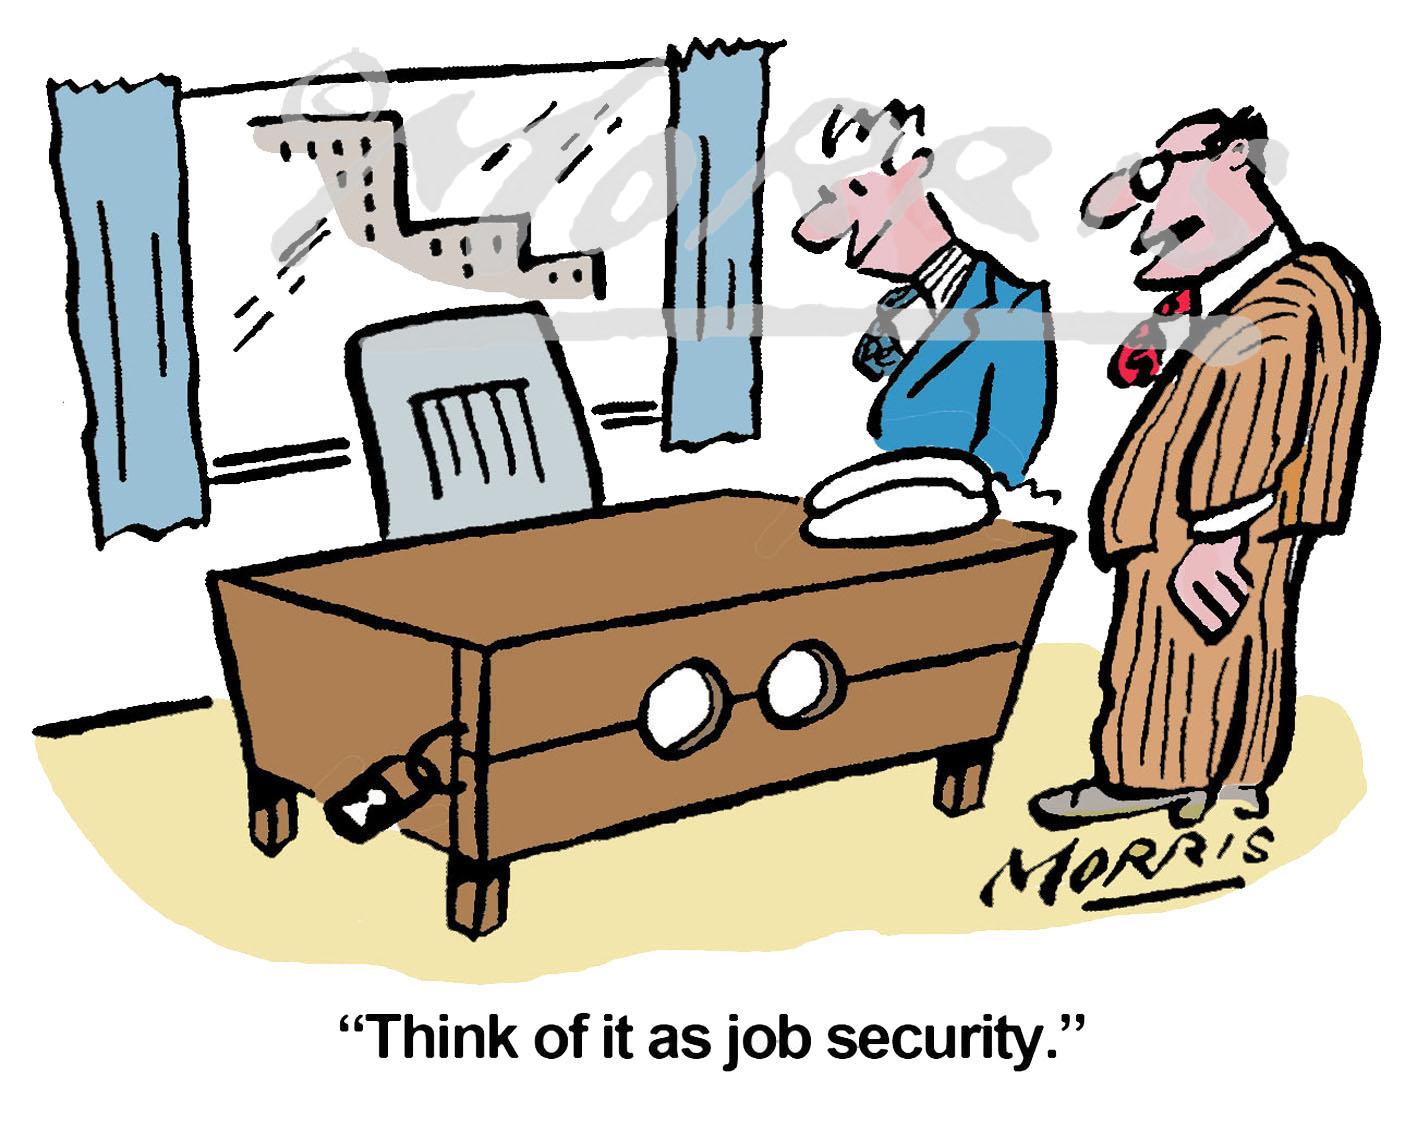 Job security cartoon, office cartoon – Ref: 7381col